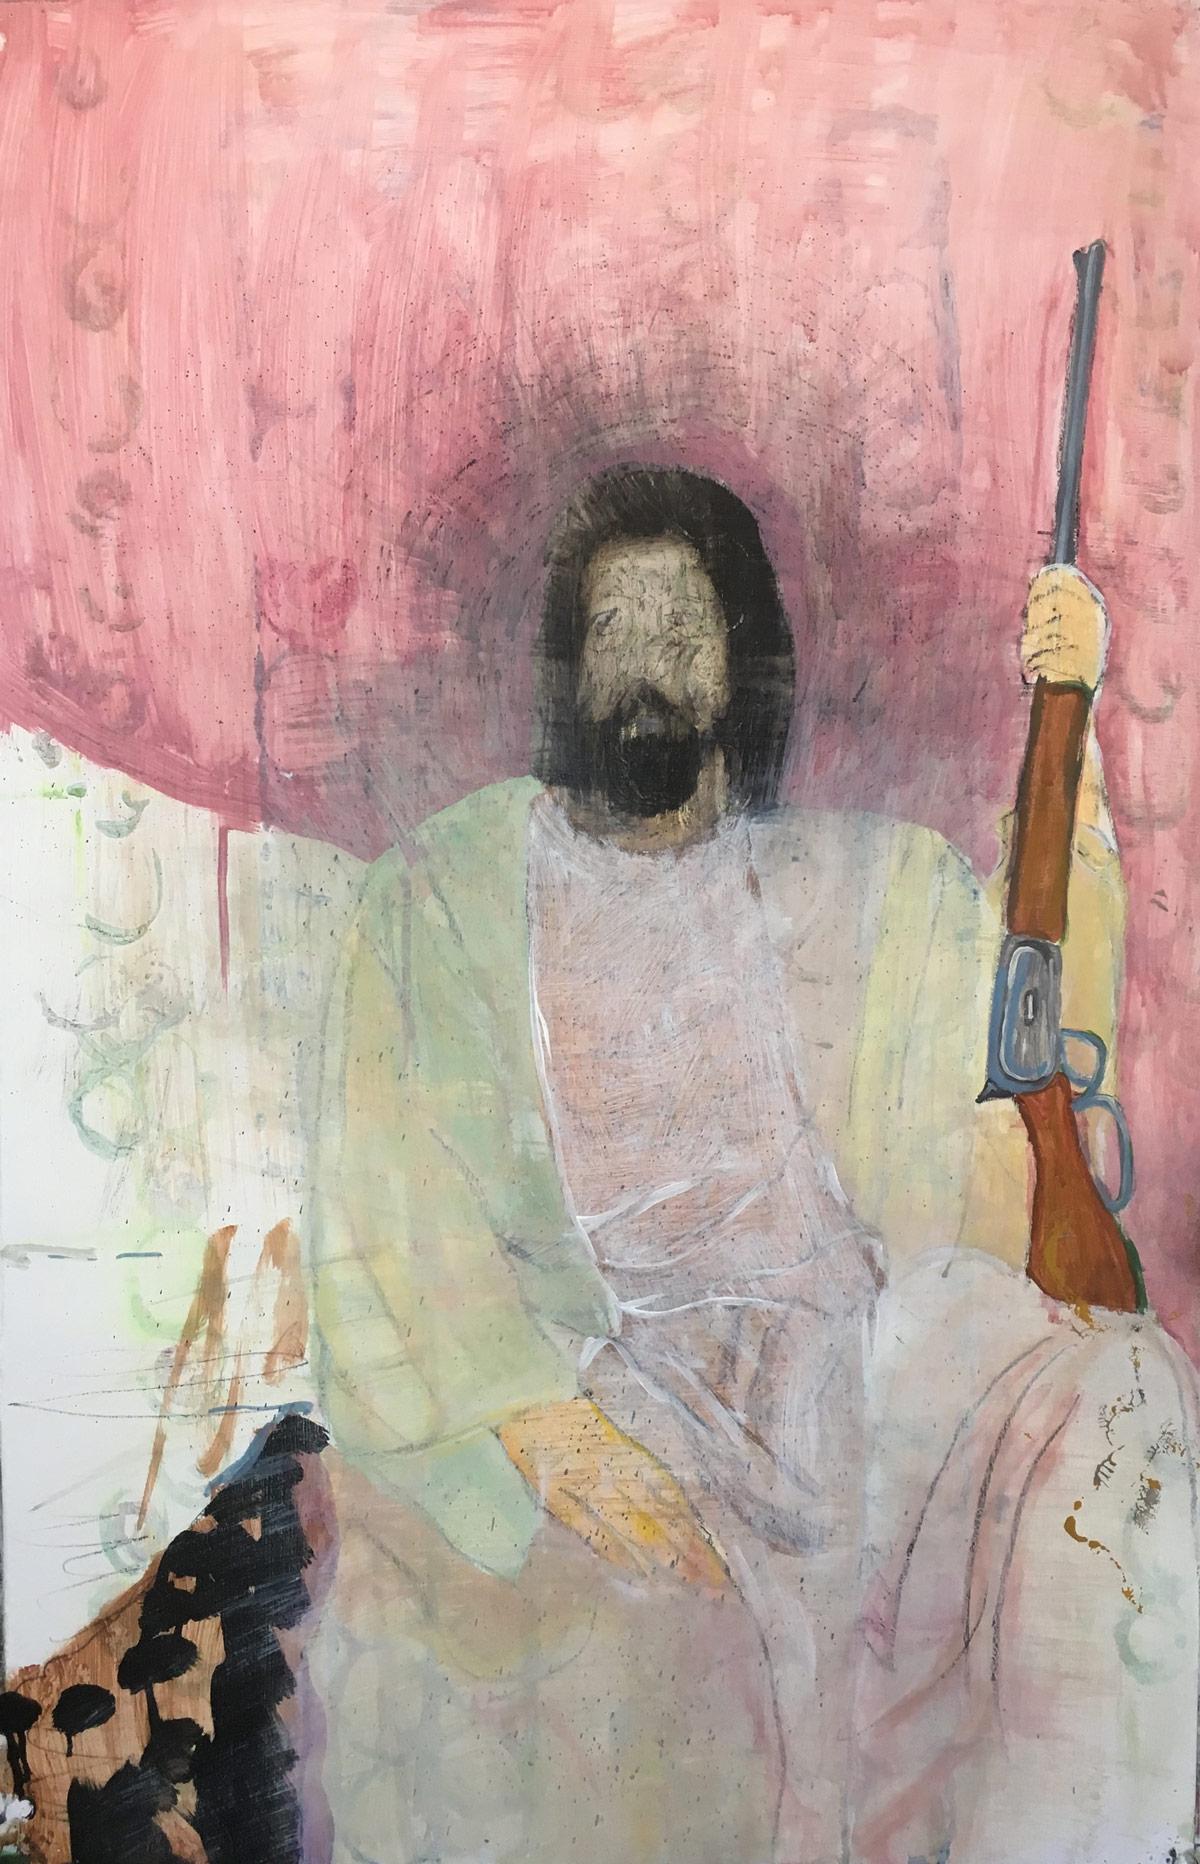 jewish gun nut, 2015